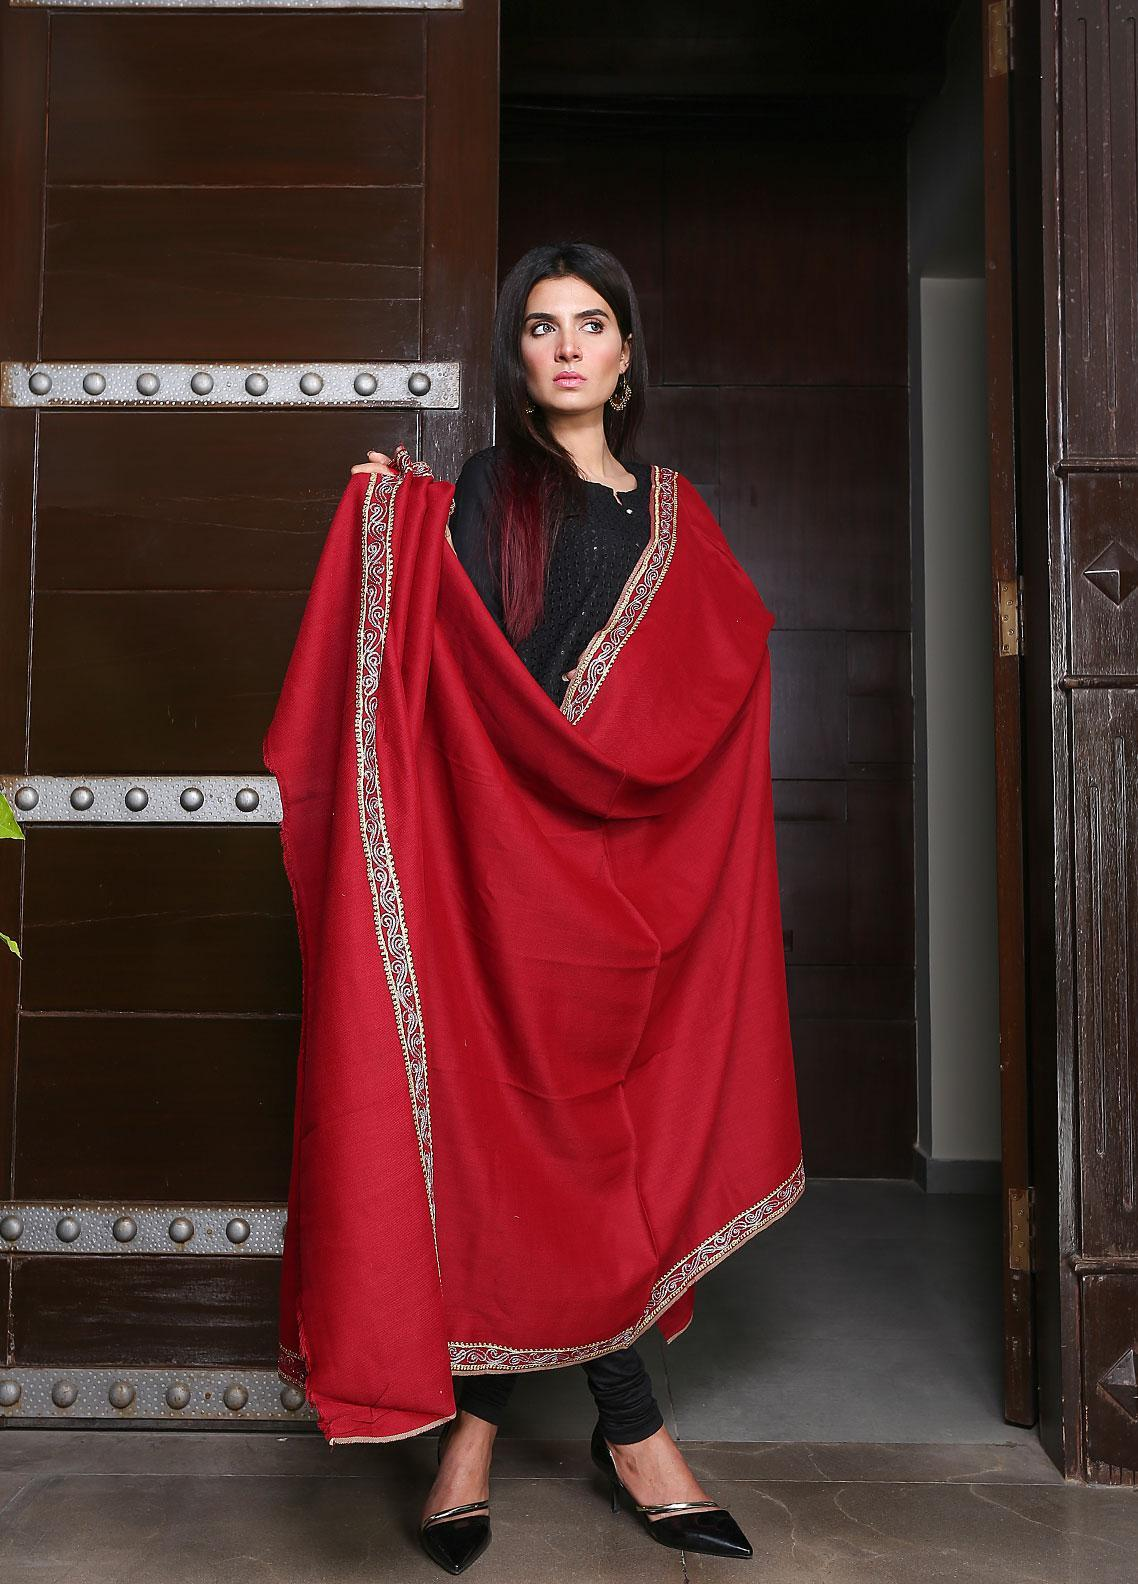 Sanaulla Exclusive Range Embroidered Pashmina Shawl 19-MIR-149 Maroon - Kashmiri Shawls